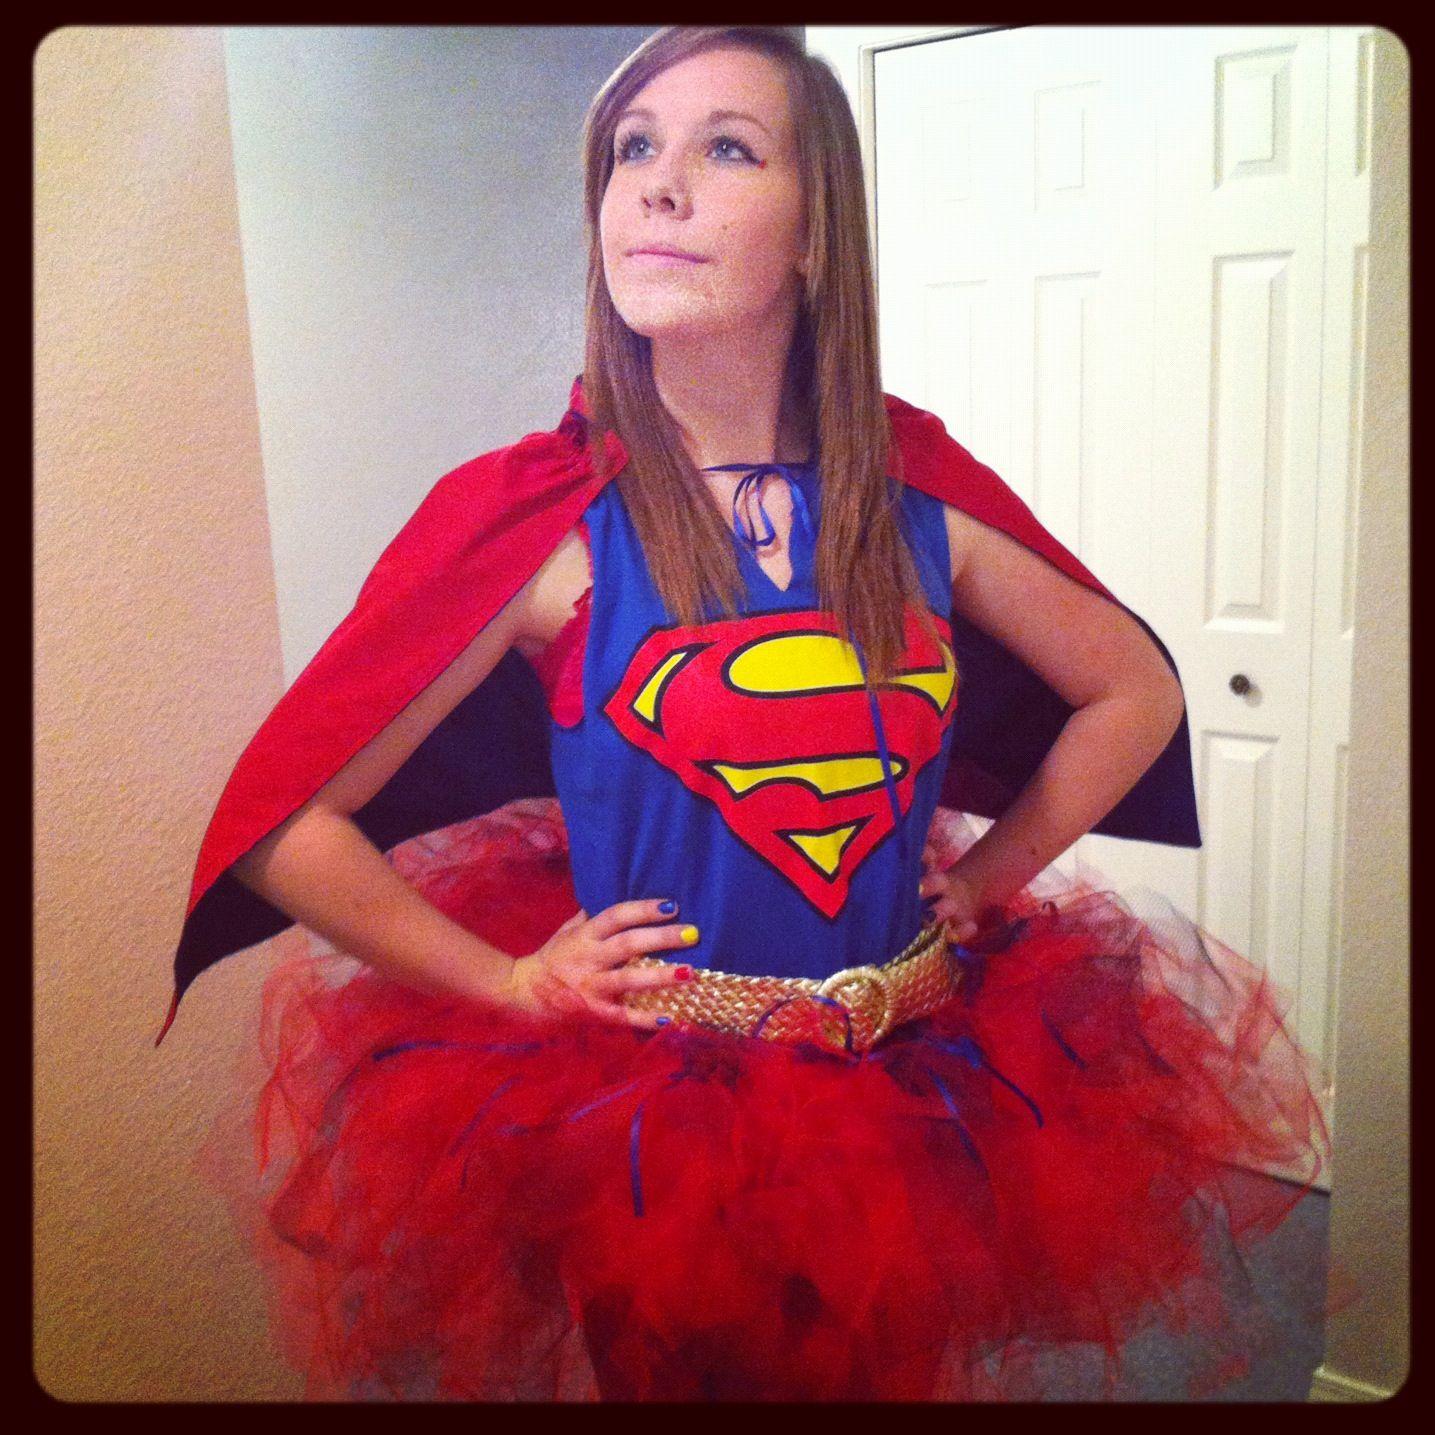 Halloween costume idea.. Superman with a tutu, girly yet